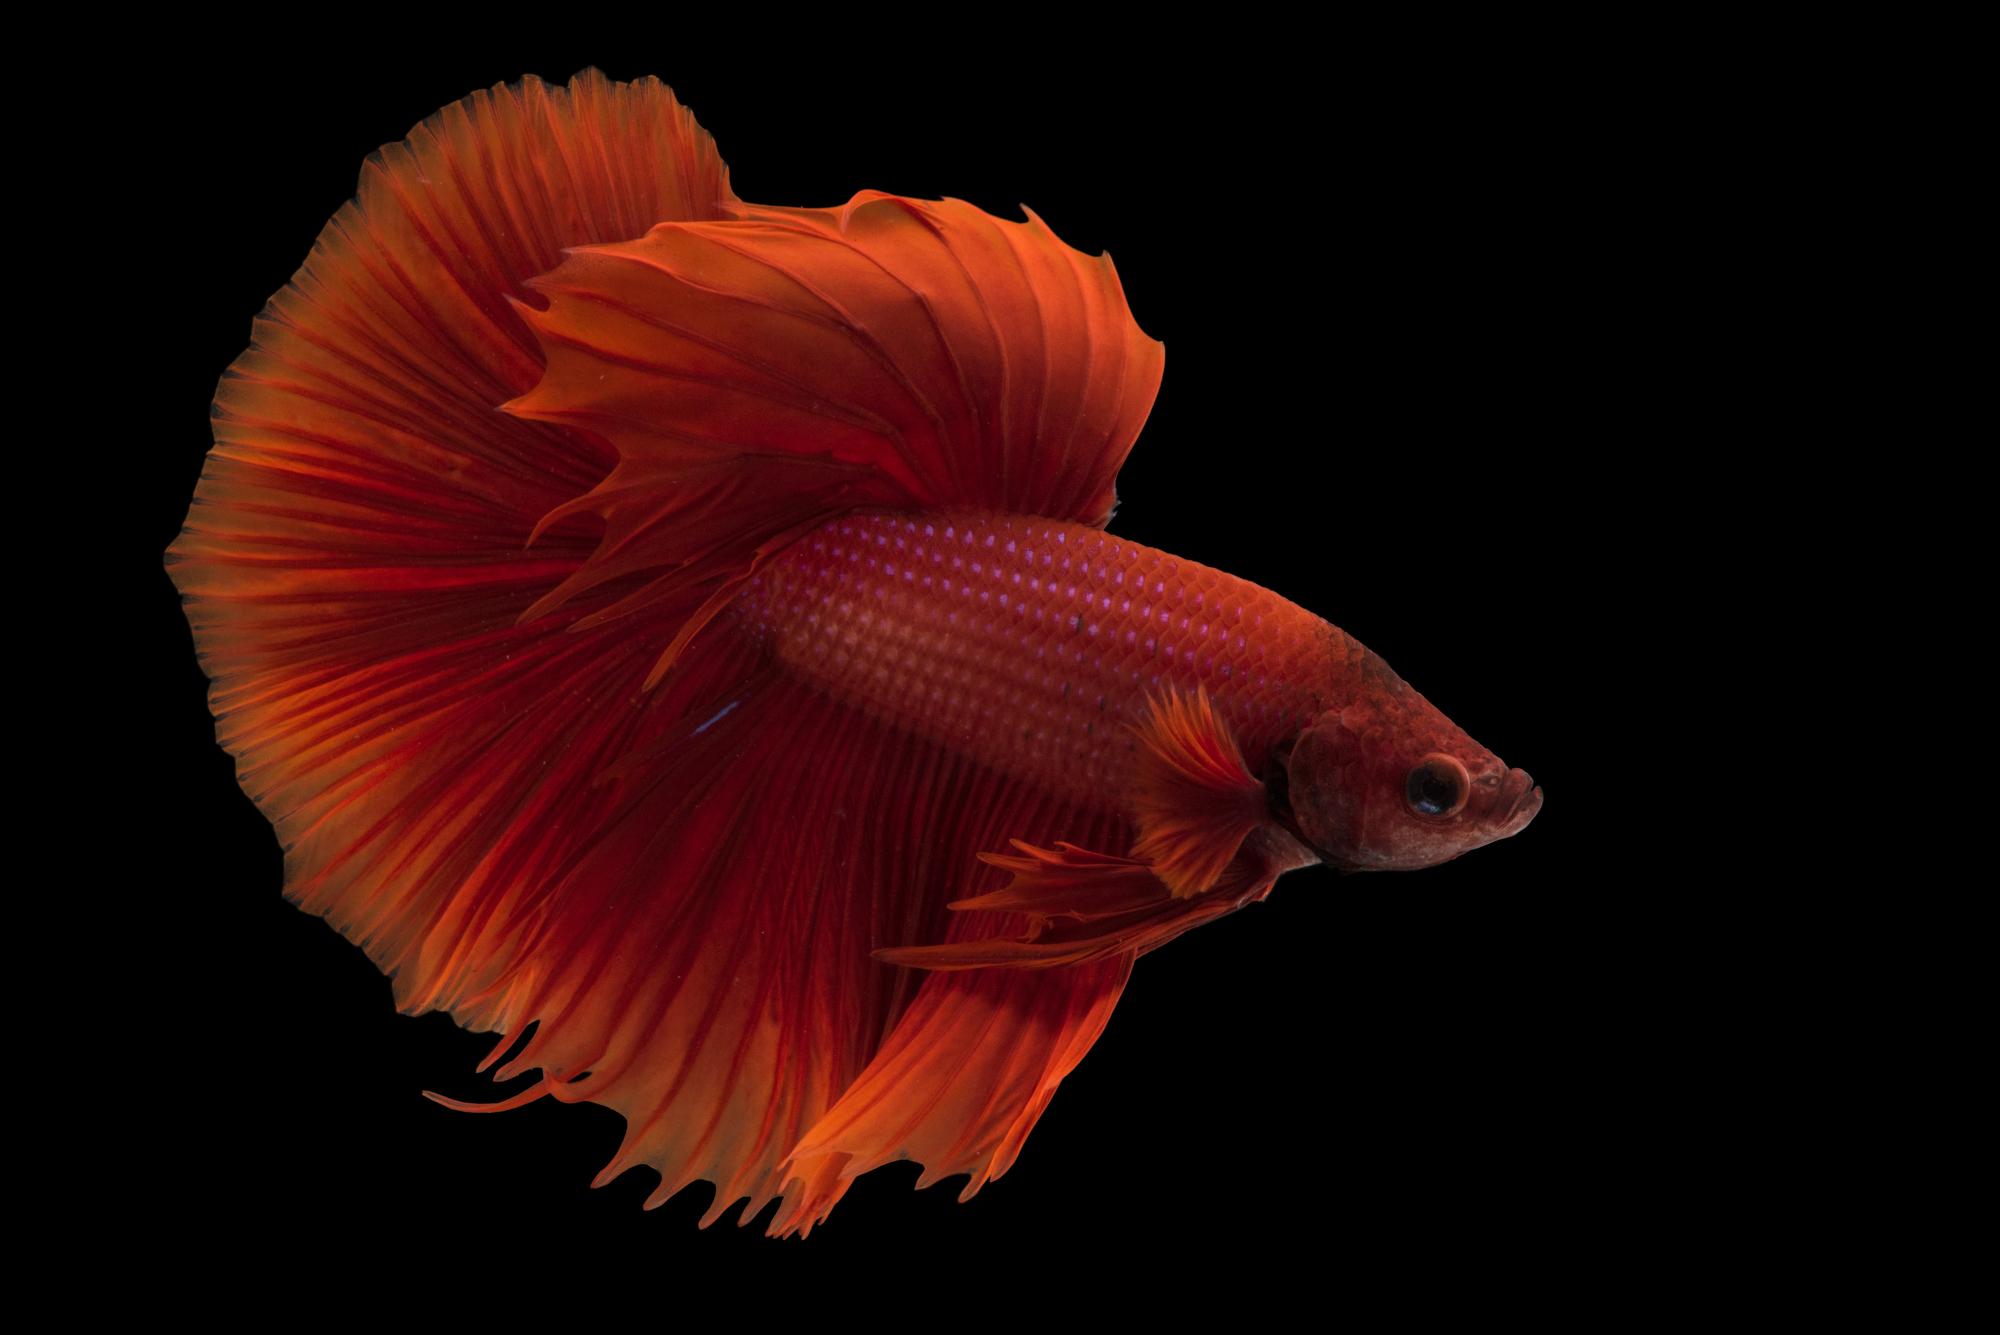 siamese fighting fish red